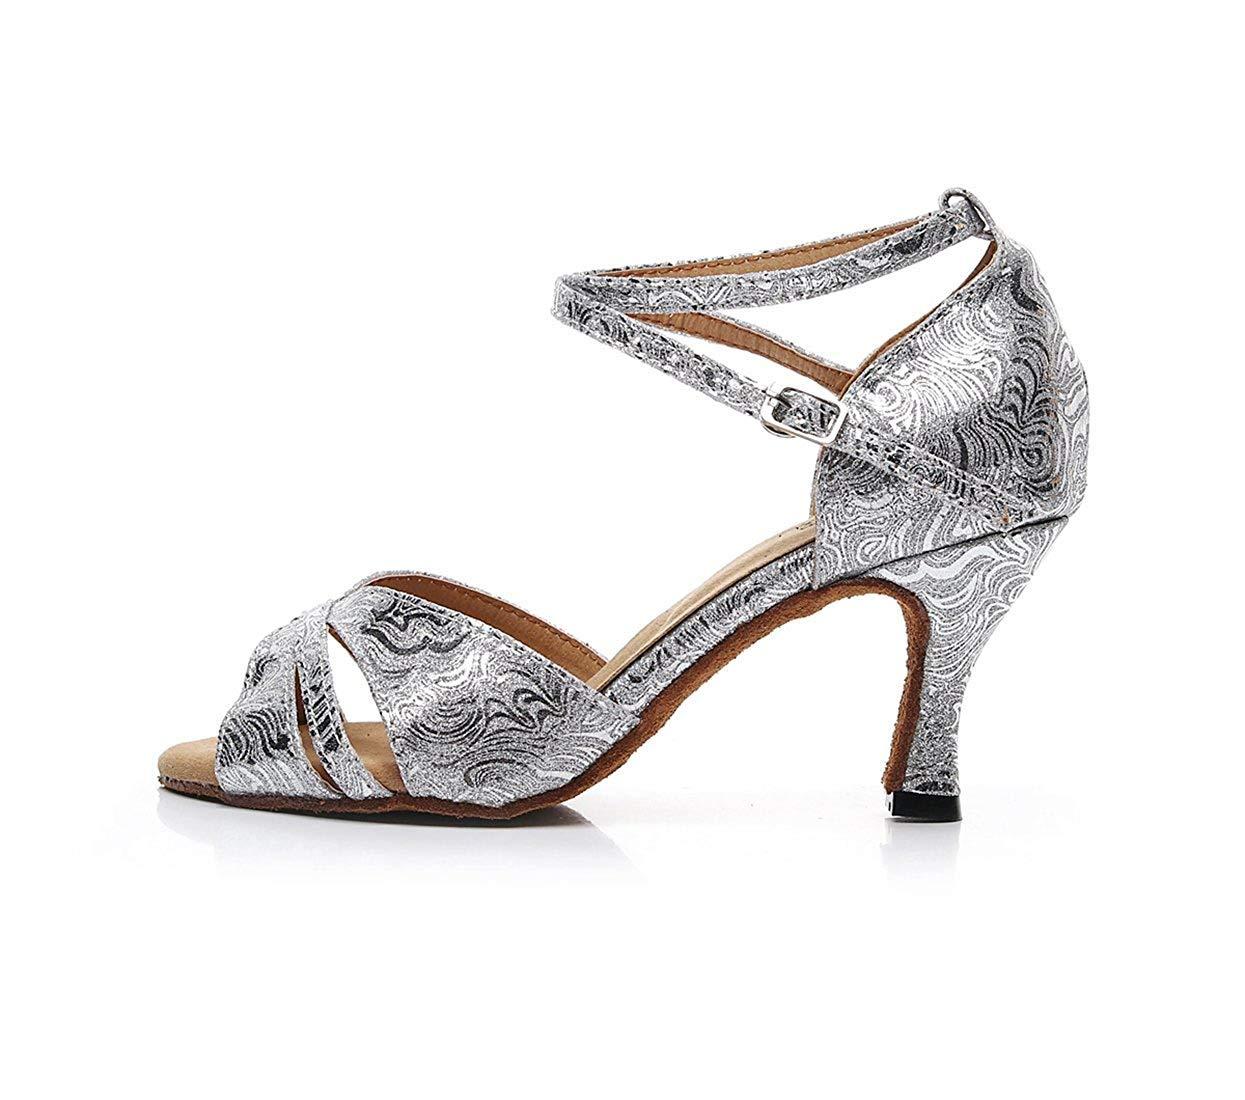 Qiusa Damen Knöchelriemen Silber Glitter Glitter Glitter Salsa Latin Ballroom Dance Sandalen Hochzeit Schuhe UK 2.5 (Farbe   rot-3.5  Heel, Größe   -)  c92b16